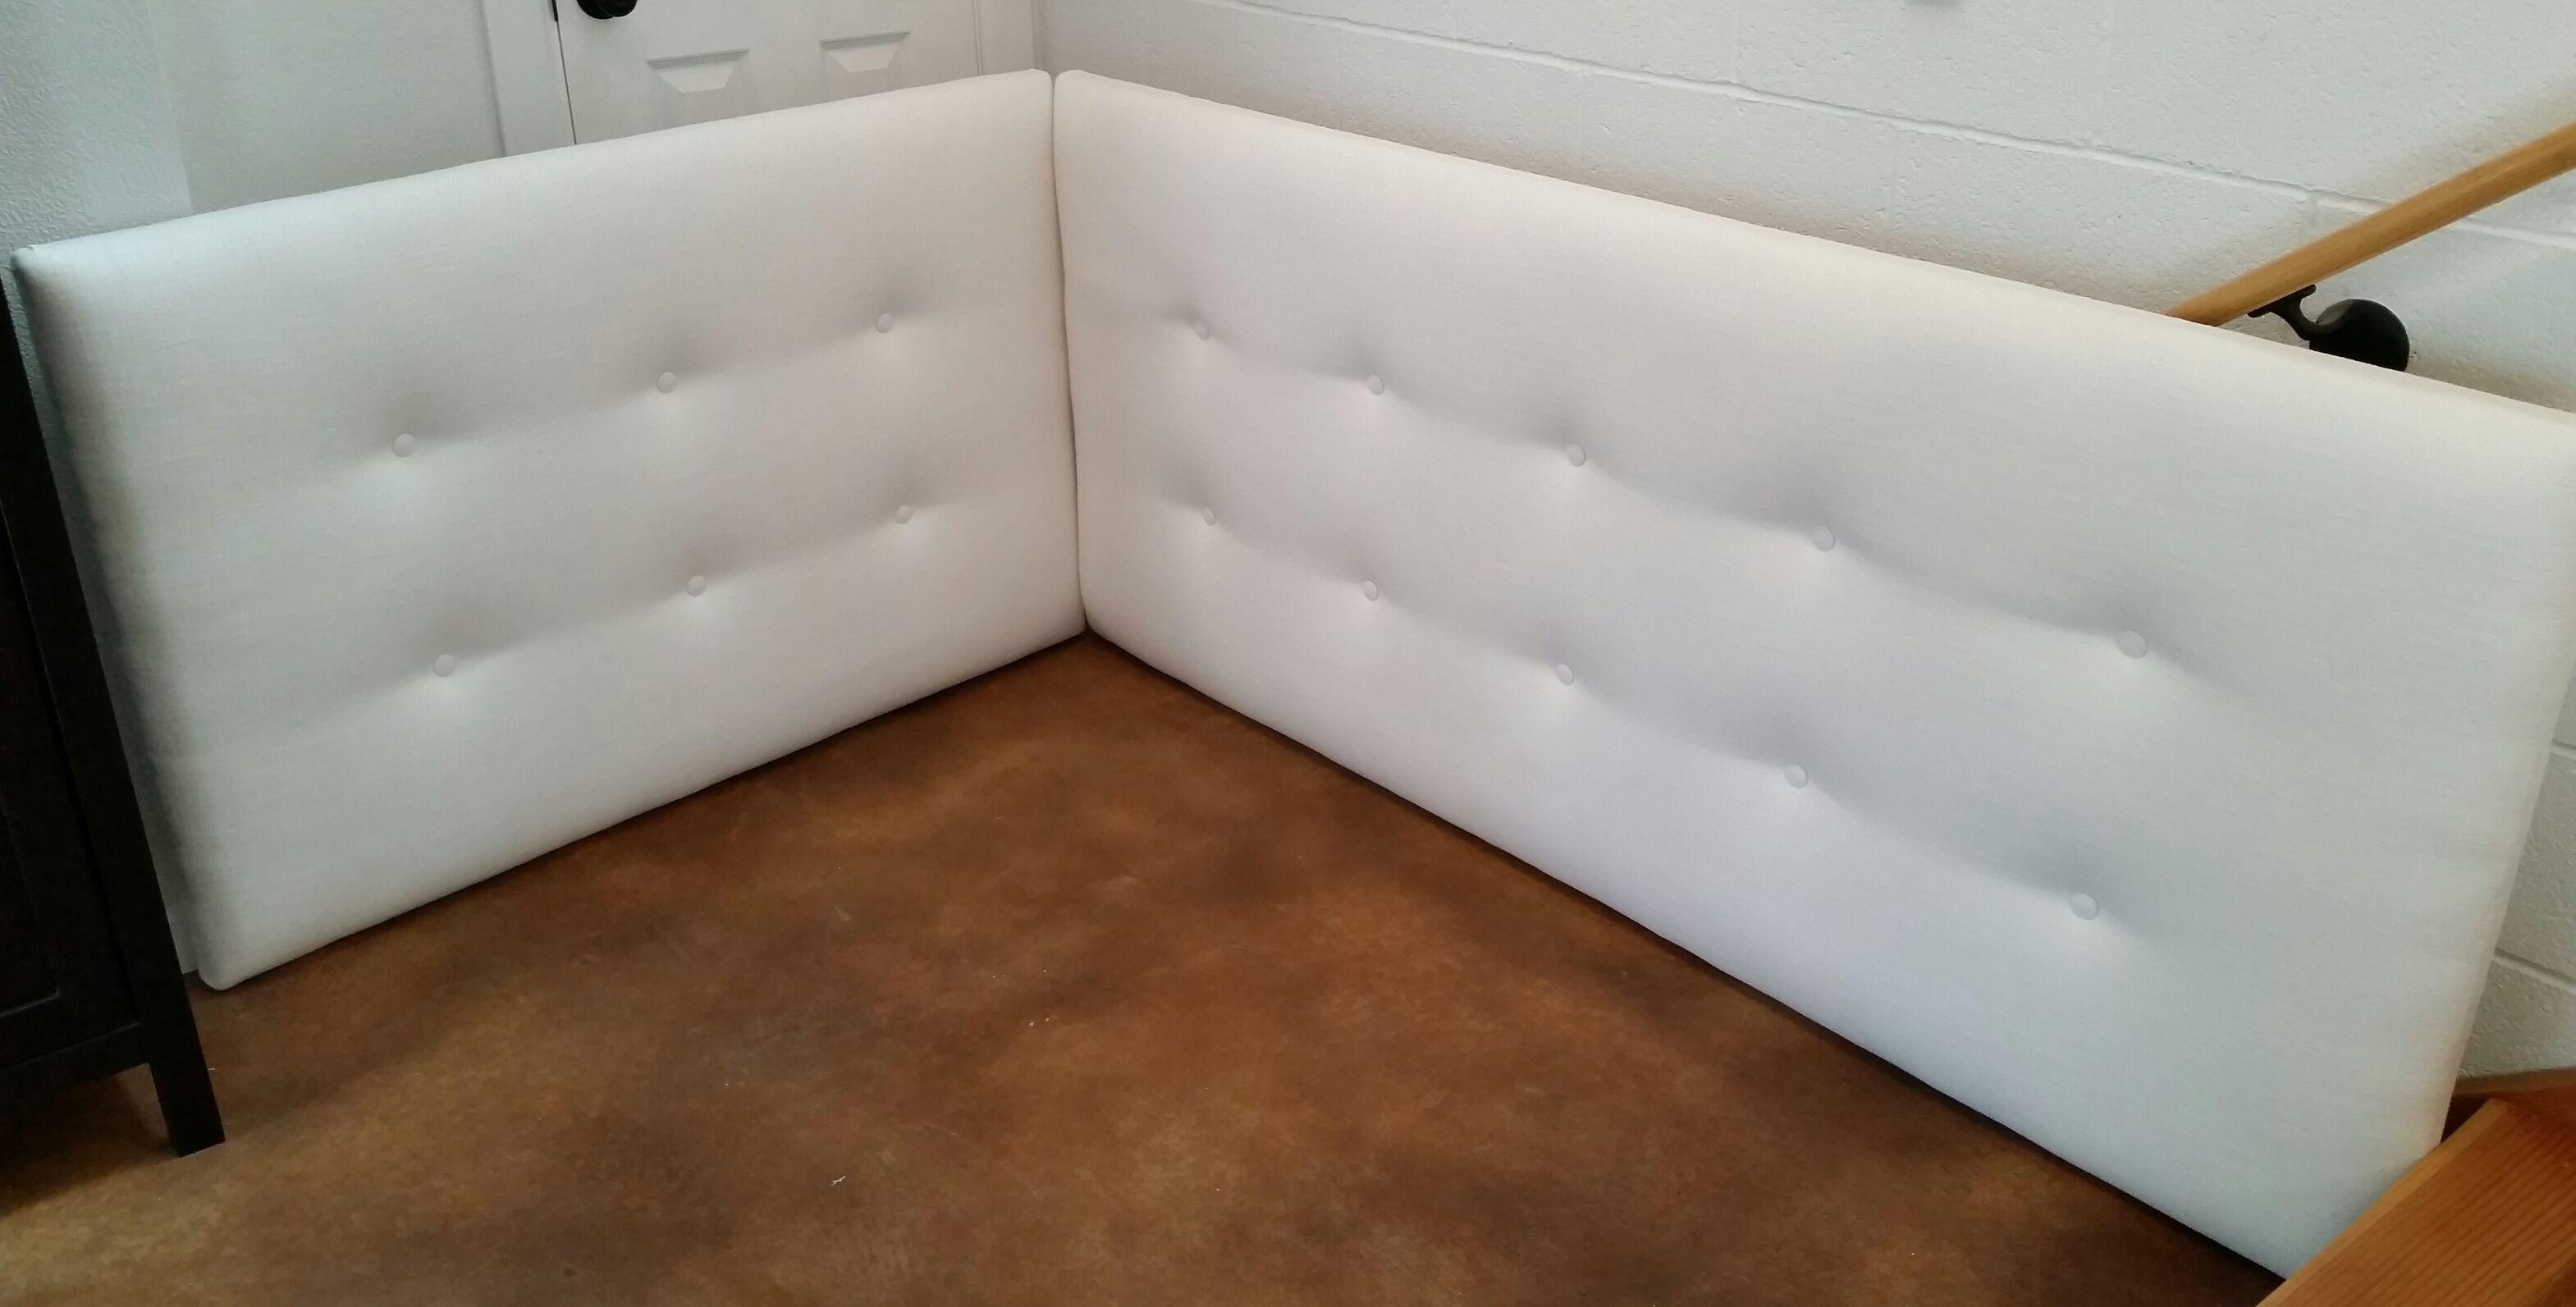 Corner day bed tufted upholstered headboard custom wall ...